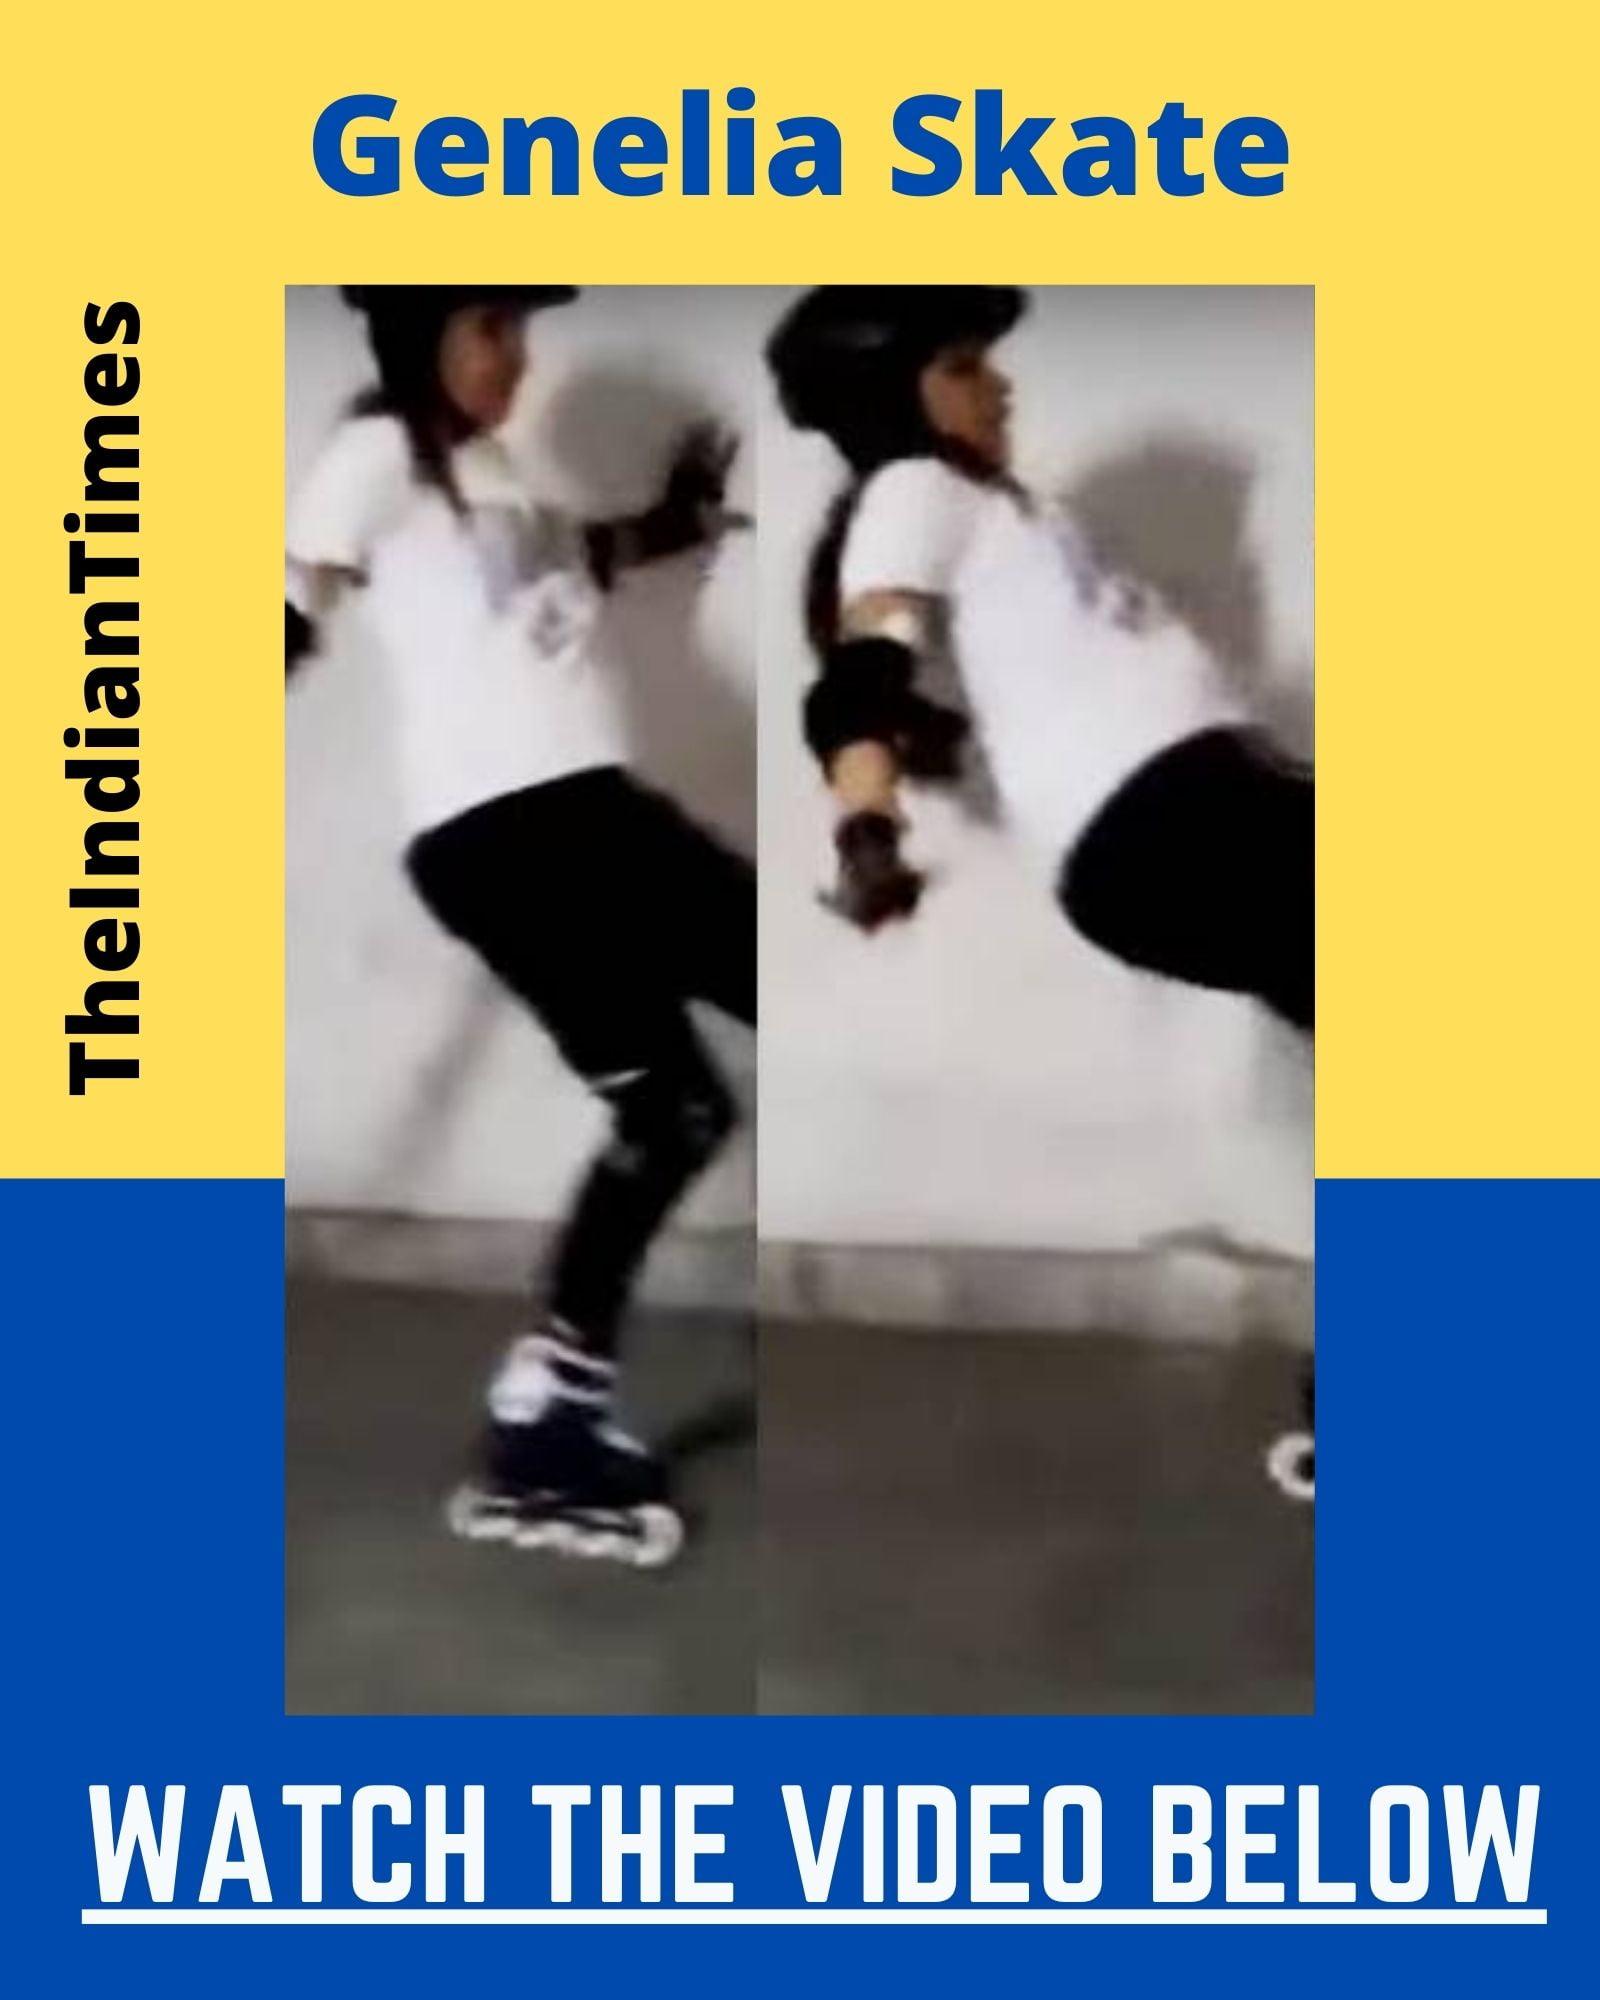 Skating செய்து கையை உடைத்துக்கொண்டு நடிகை ஜெனிலியா - வைரலாகும் வீடியோ 7